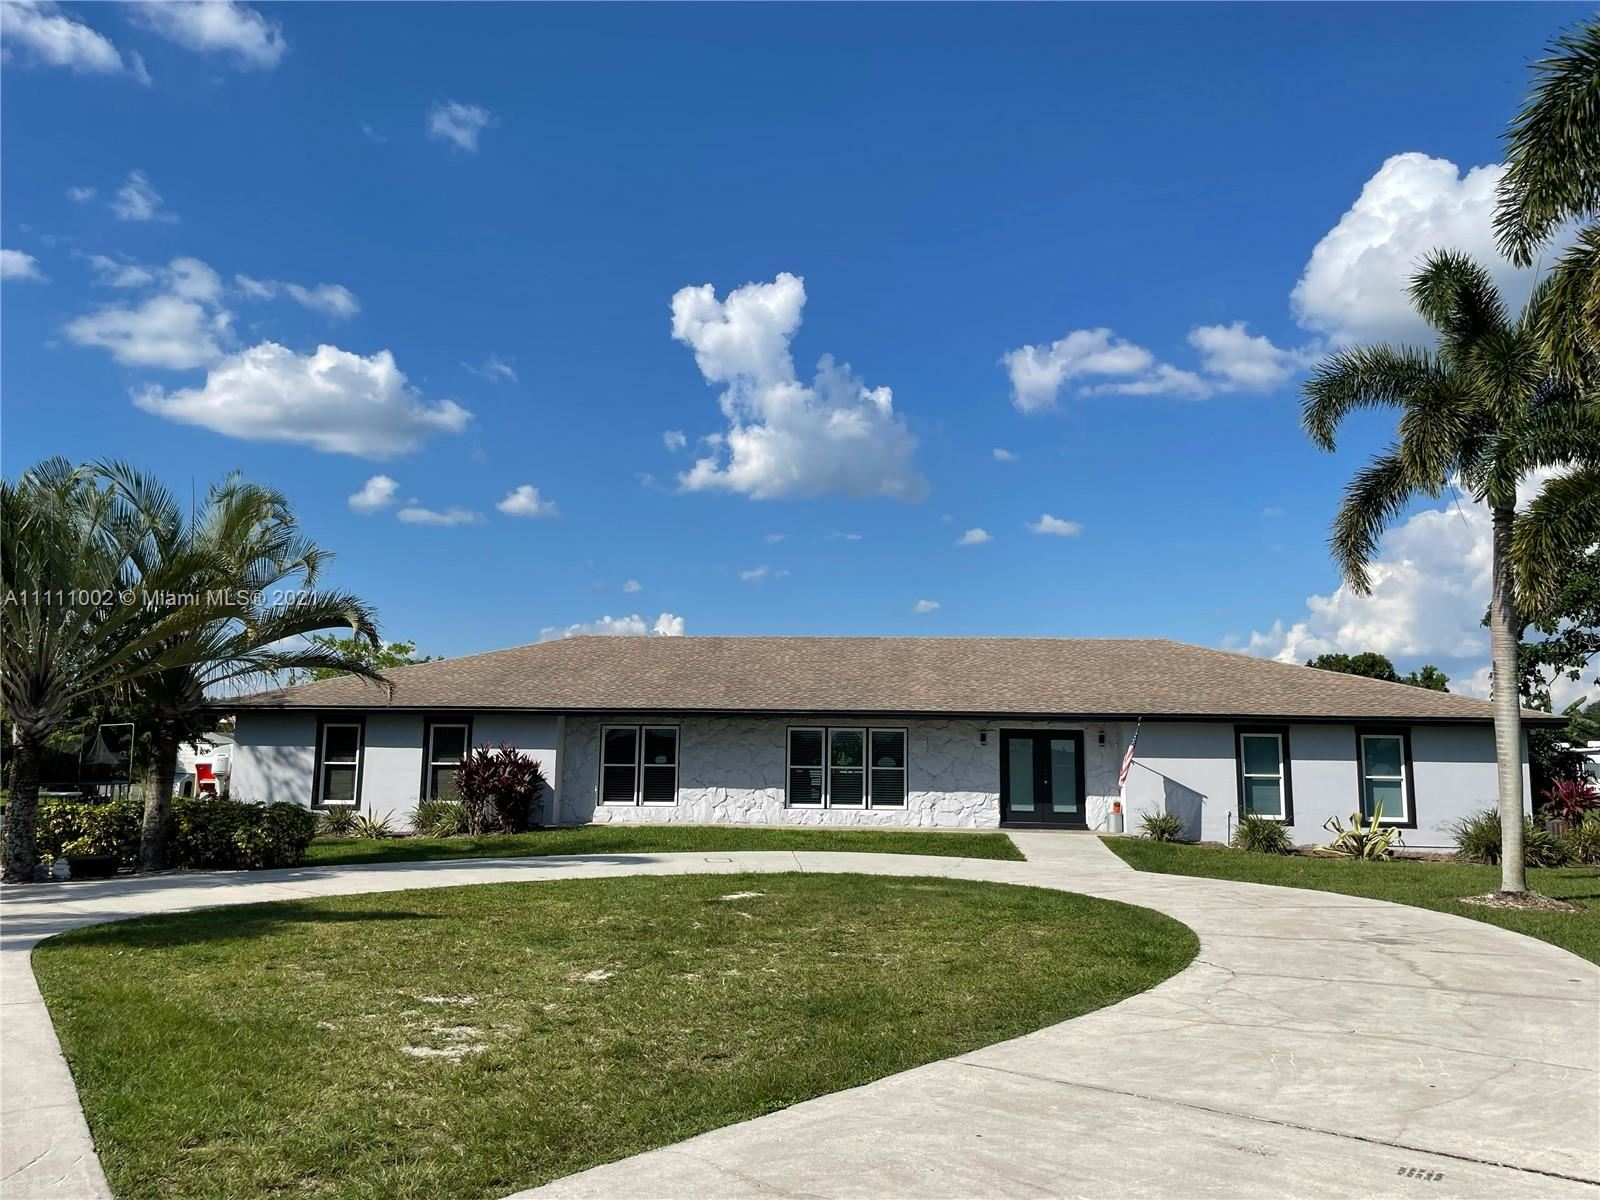 19455 SW 272nd St, Homestead, FL 33031 - #: A11111002